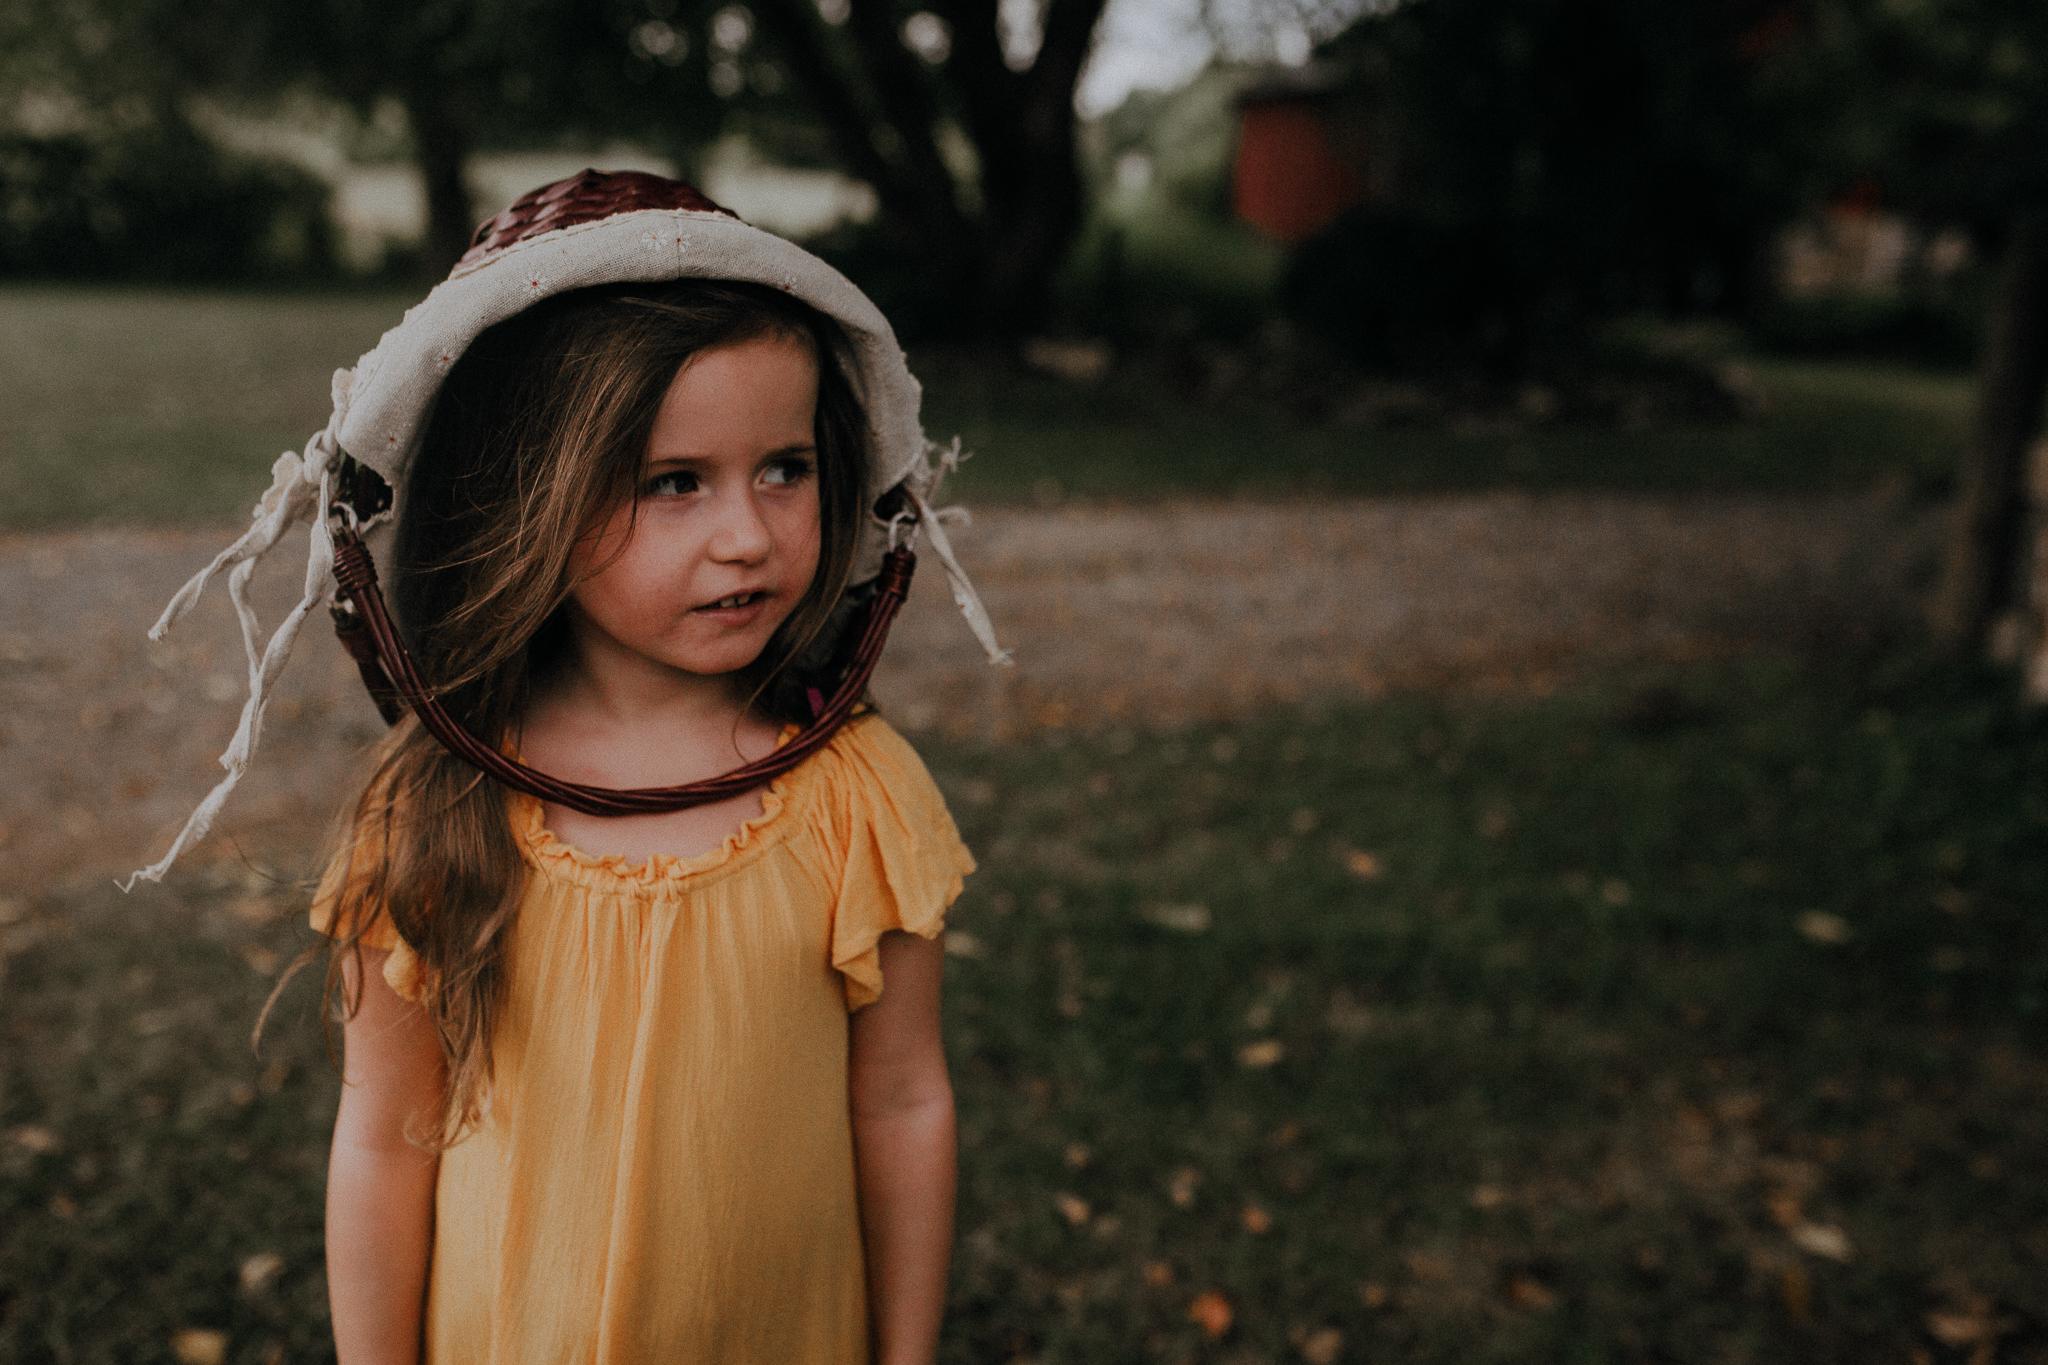 girl wearing basket on head like a hat summer Ashburn Loudoun Northern Virginia family lifestyle documentary childhood Marti Austin Photography